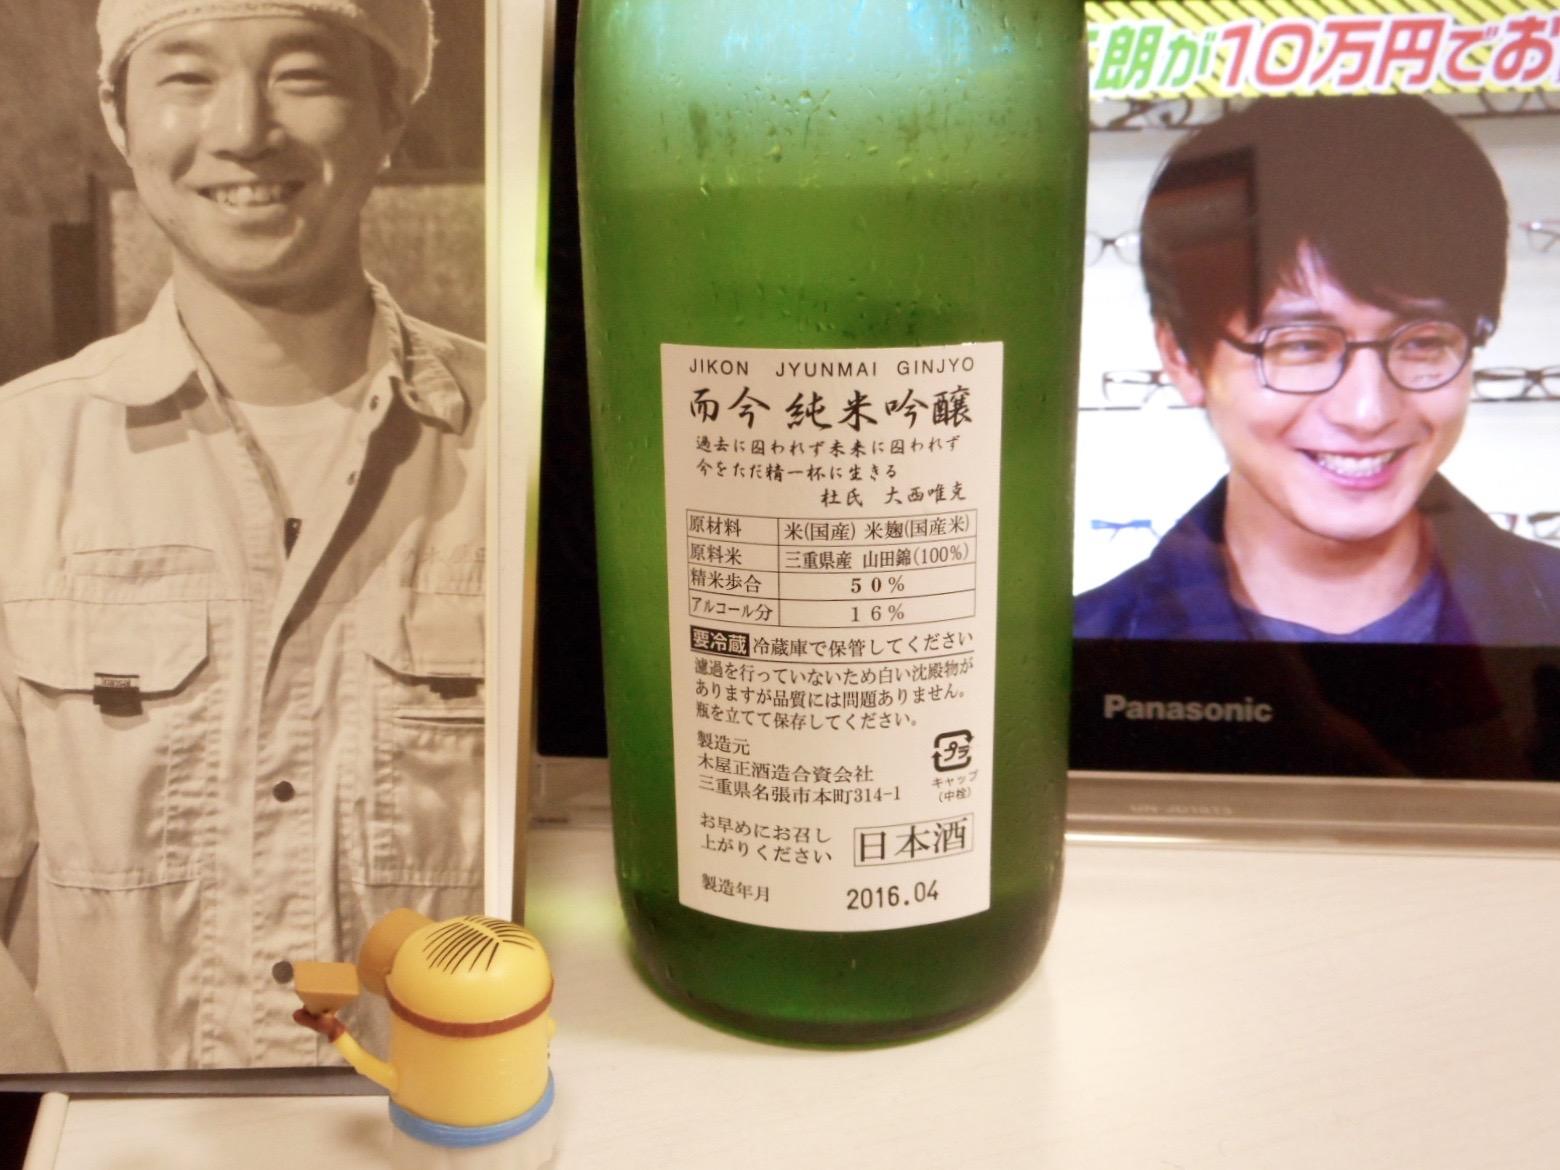 jikon_yamada_hiire2.jpg